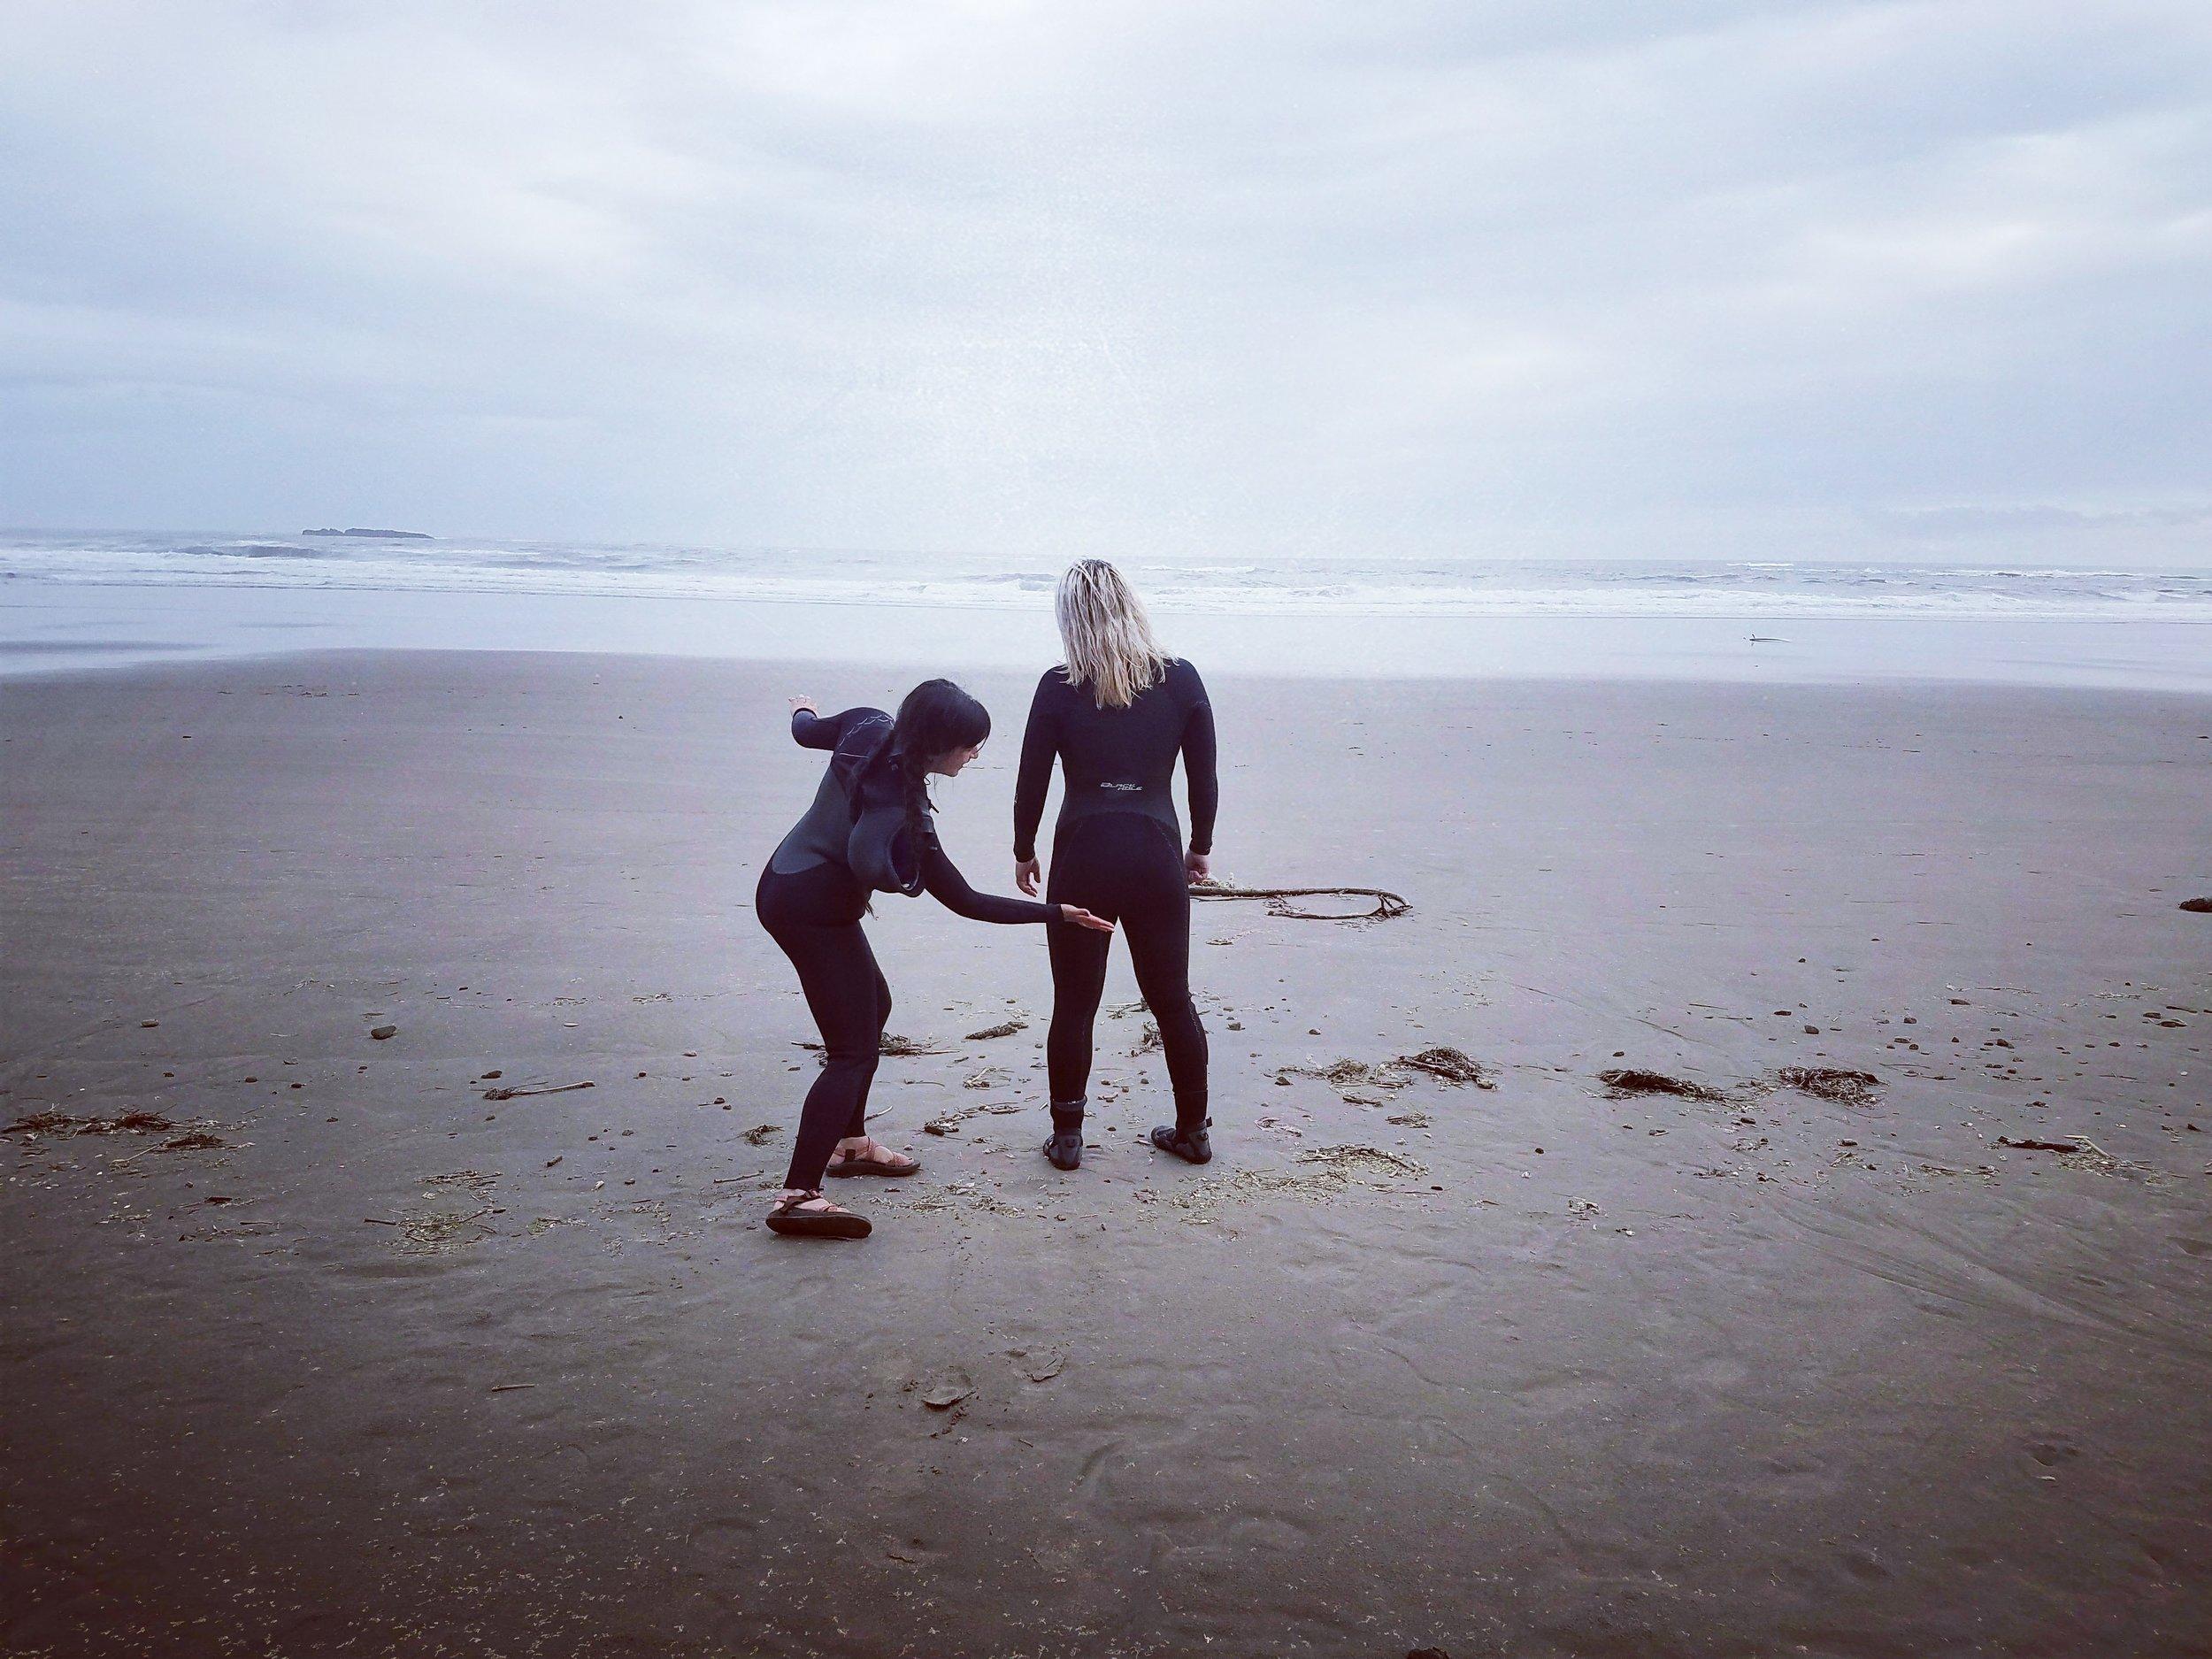 That surf lifffe.